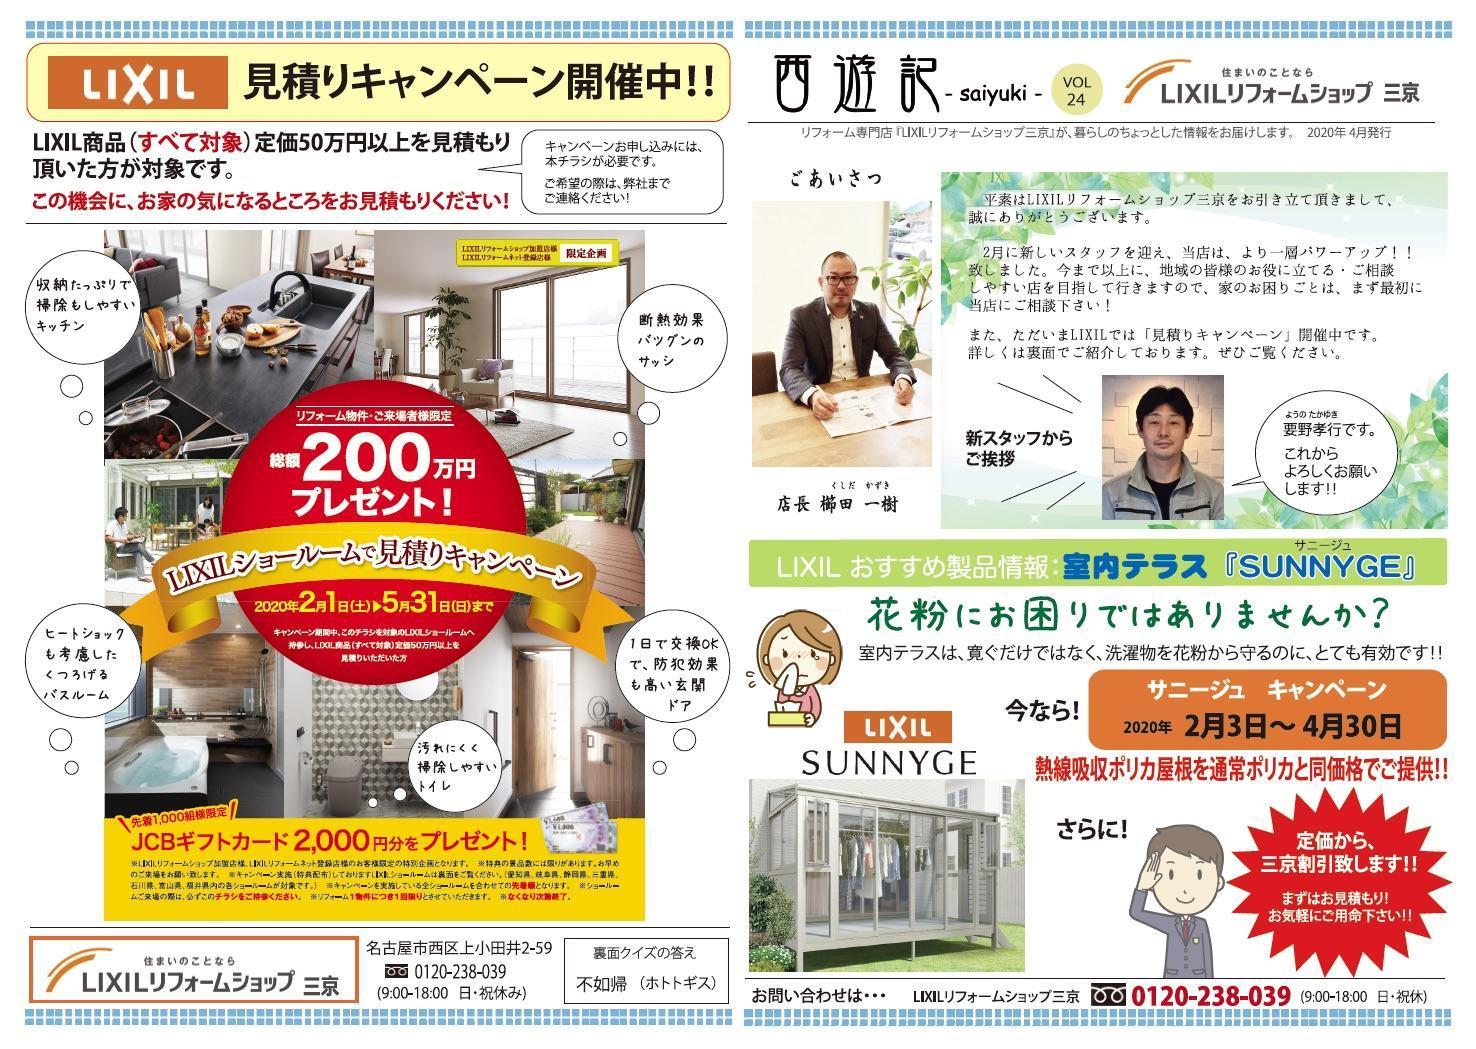 https://lixil-reformshop.jp/shop/SC00231038/photos/8764985f97a2c158735e12e8c9c967f4814f4cf4.jpg